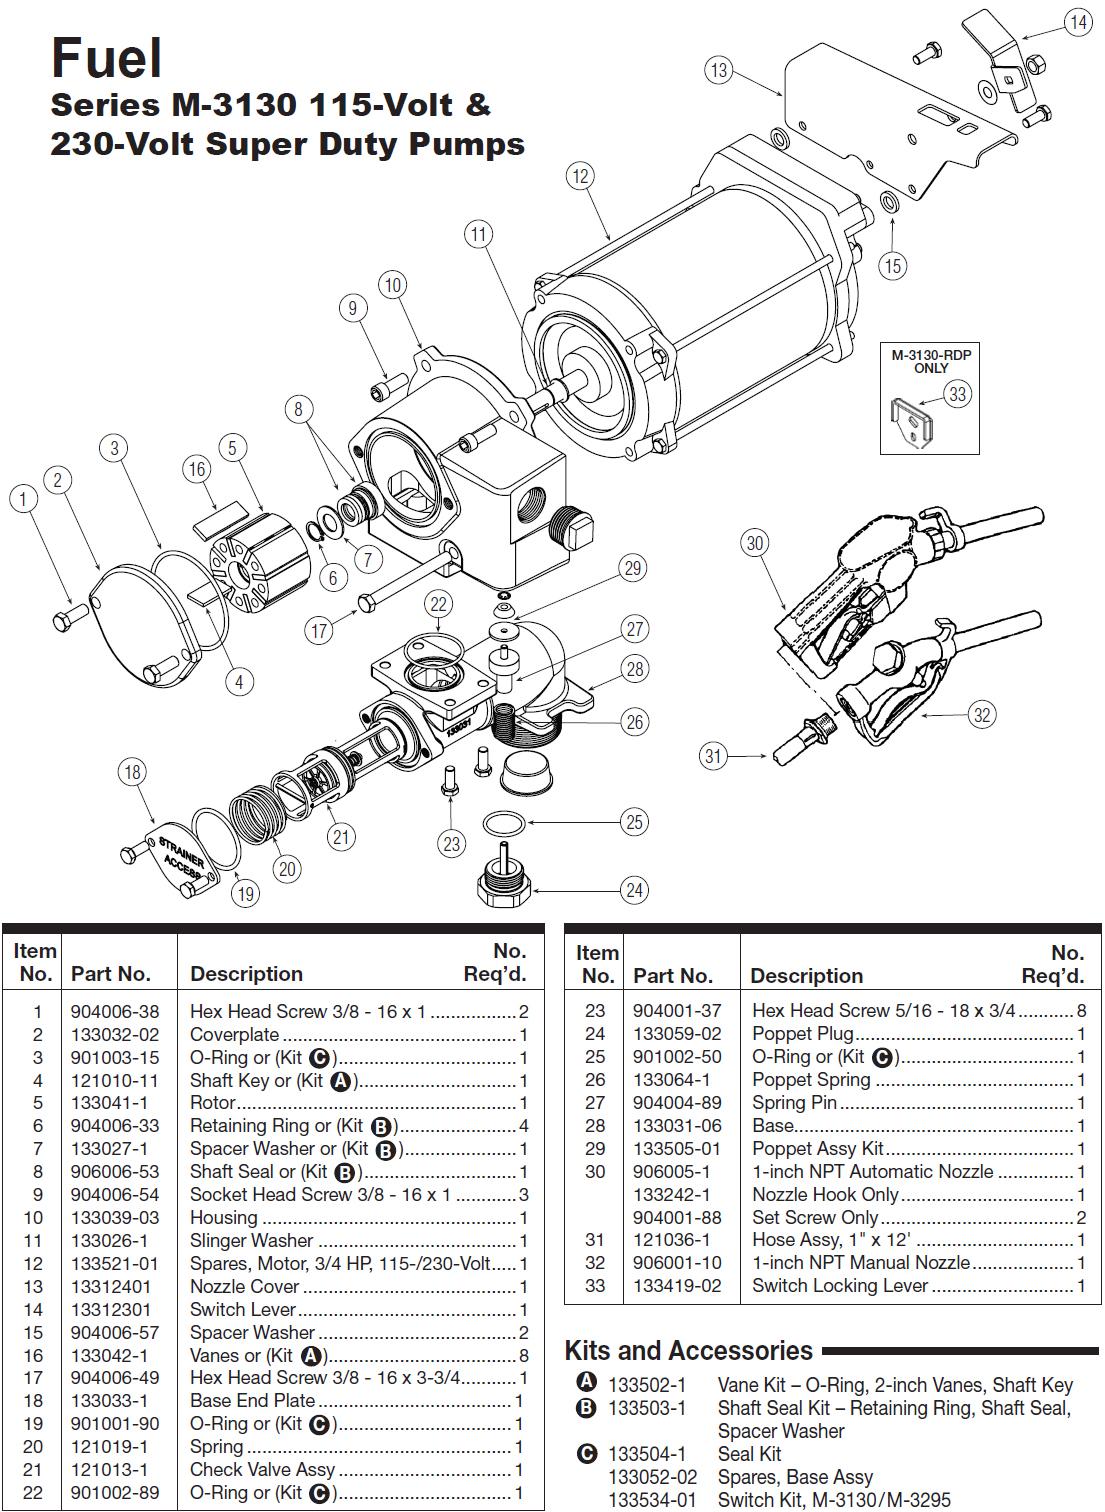 GPI M-3130-PO XTS 115/230V Super Duty Fuel Transfer Pump